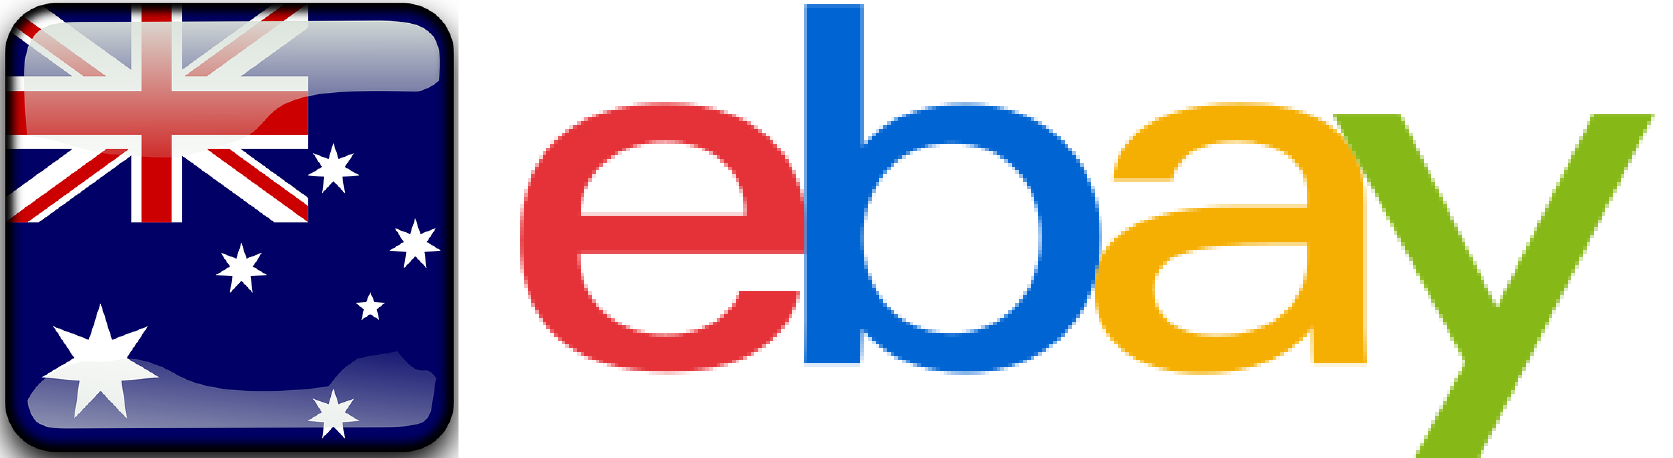 ebay-aus-01.png